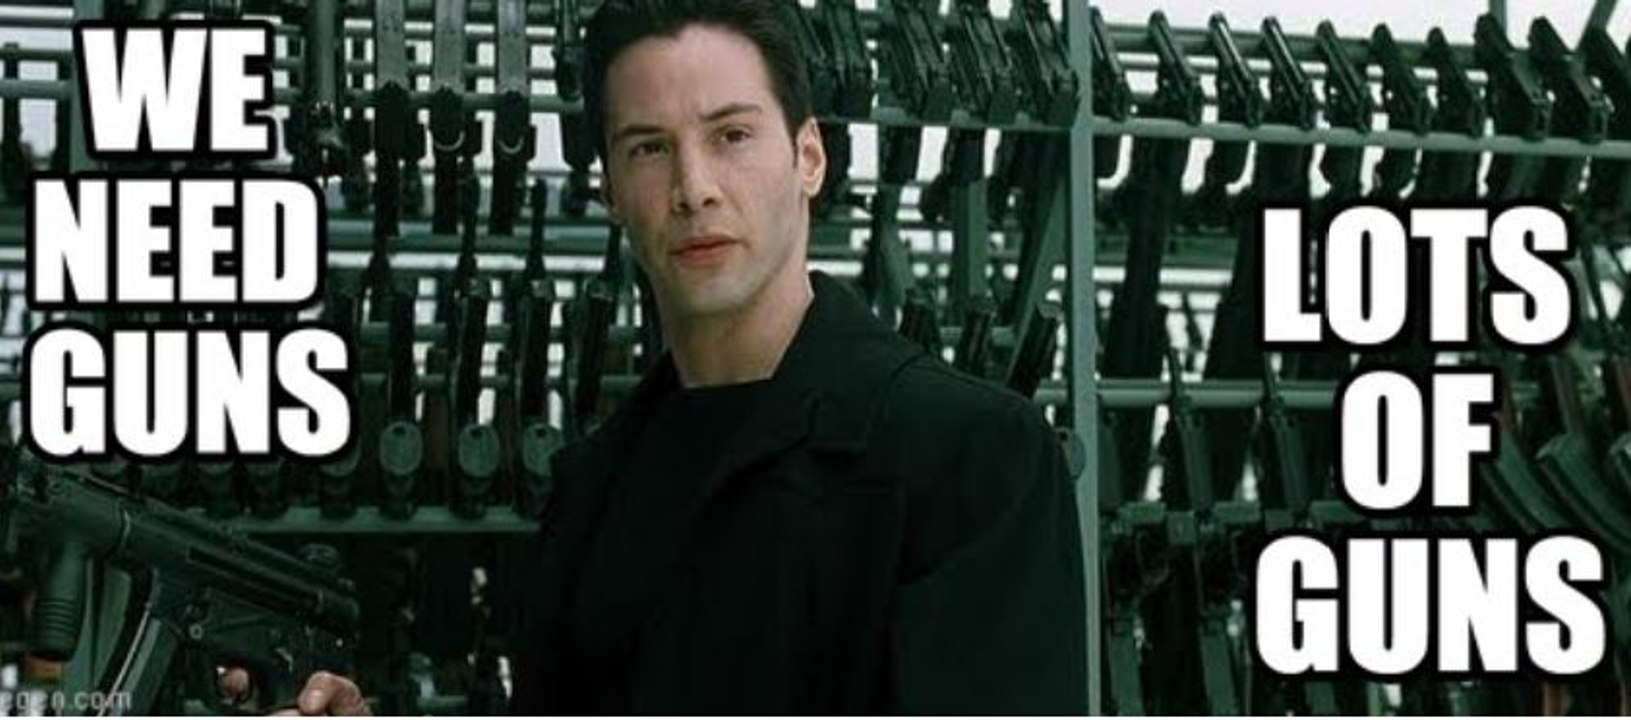 Matrix : we need guns, lots of guns - Keanu Reeves 1999 - Vidéo Dailymotion